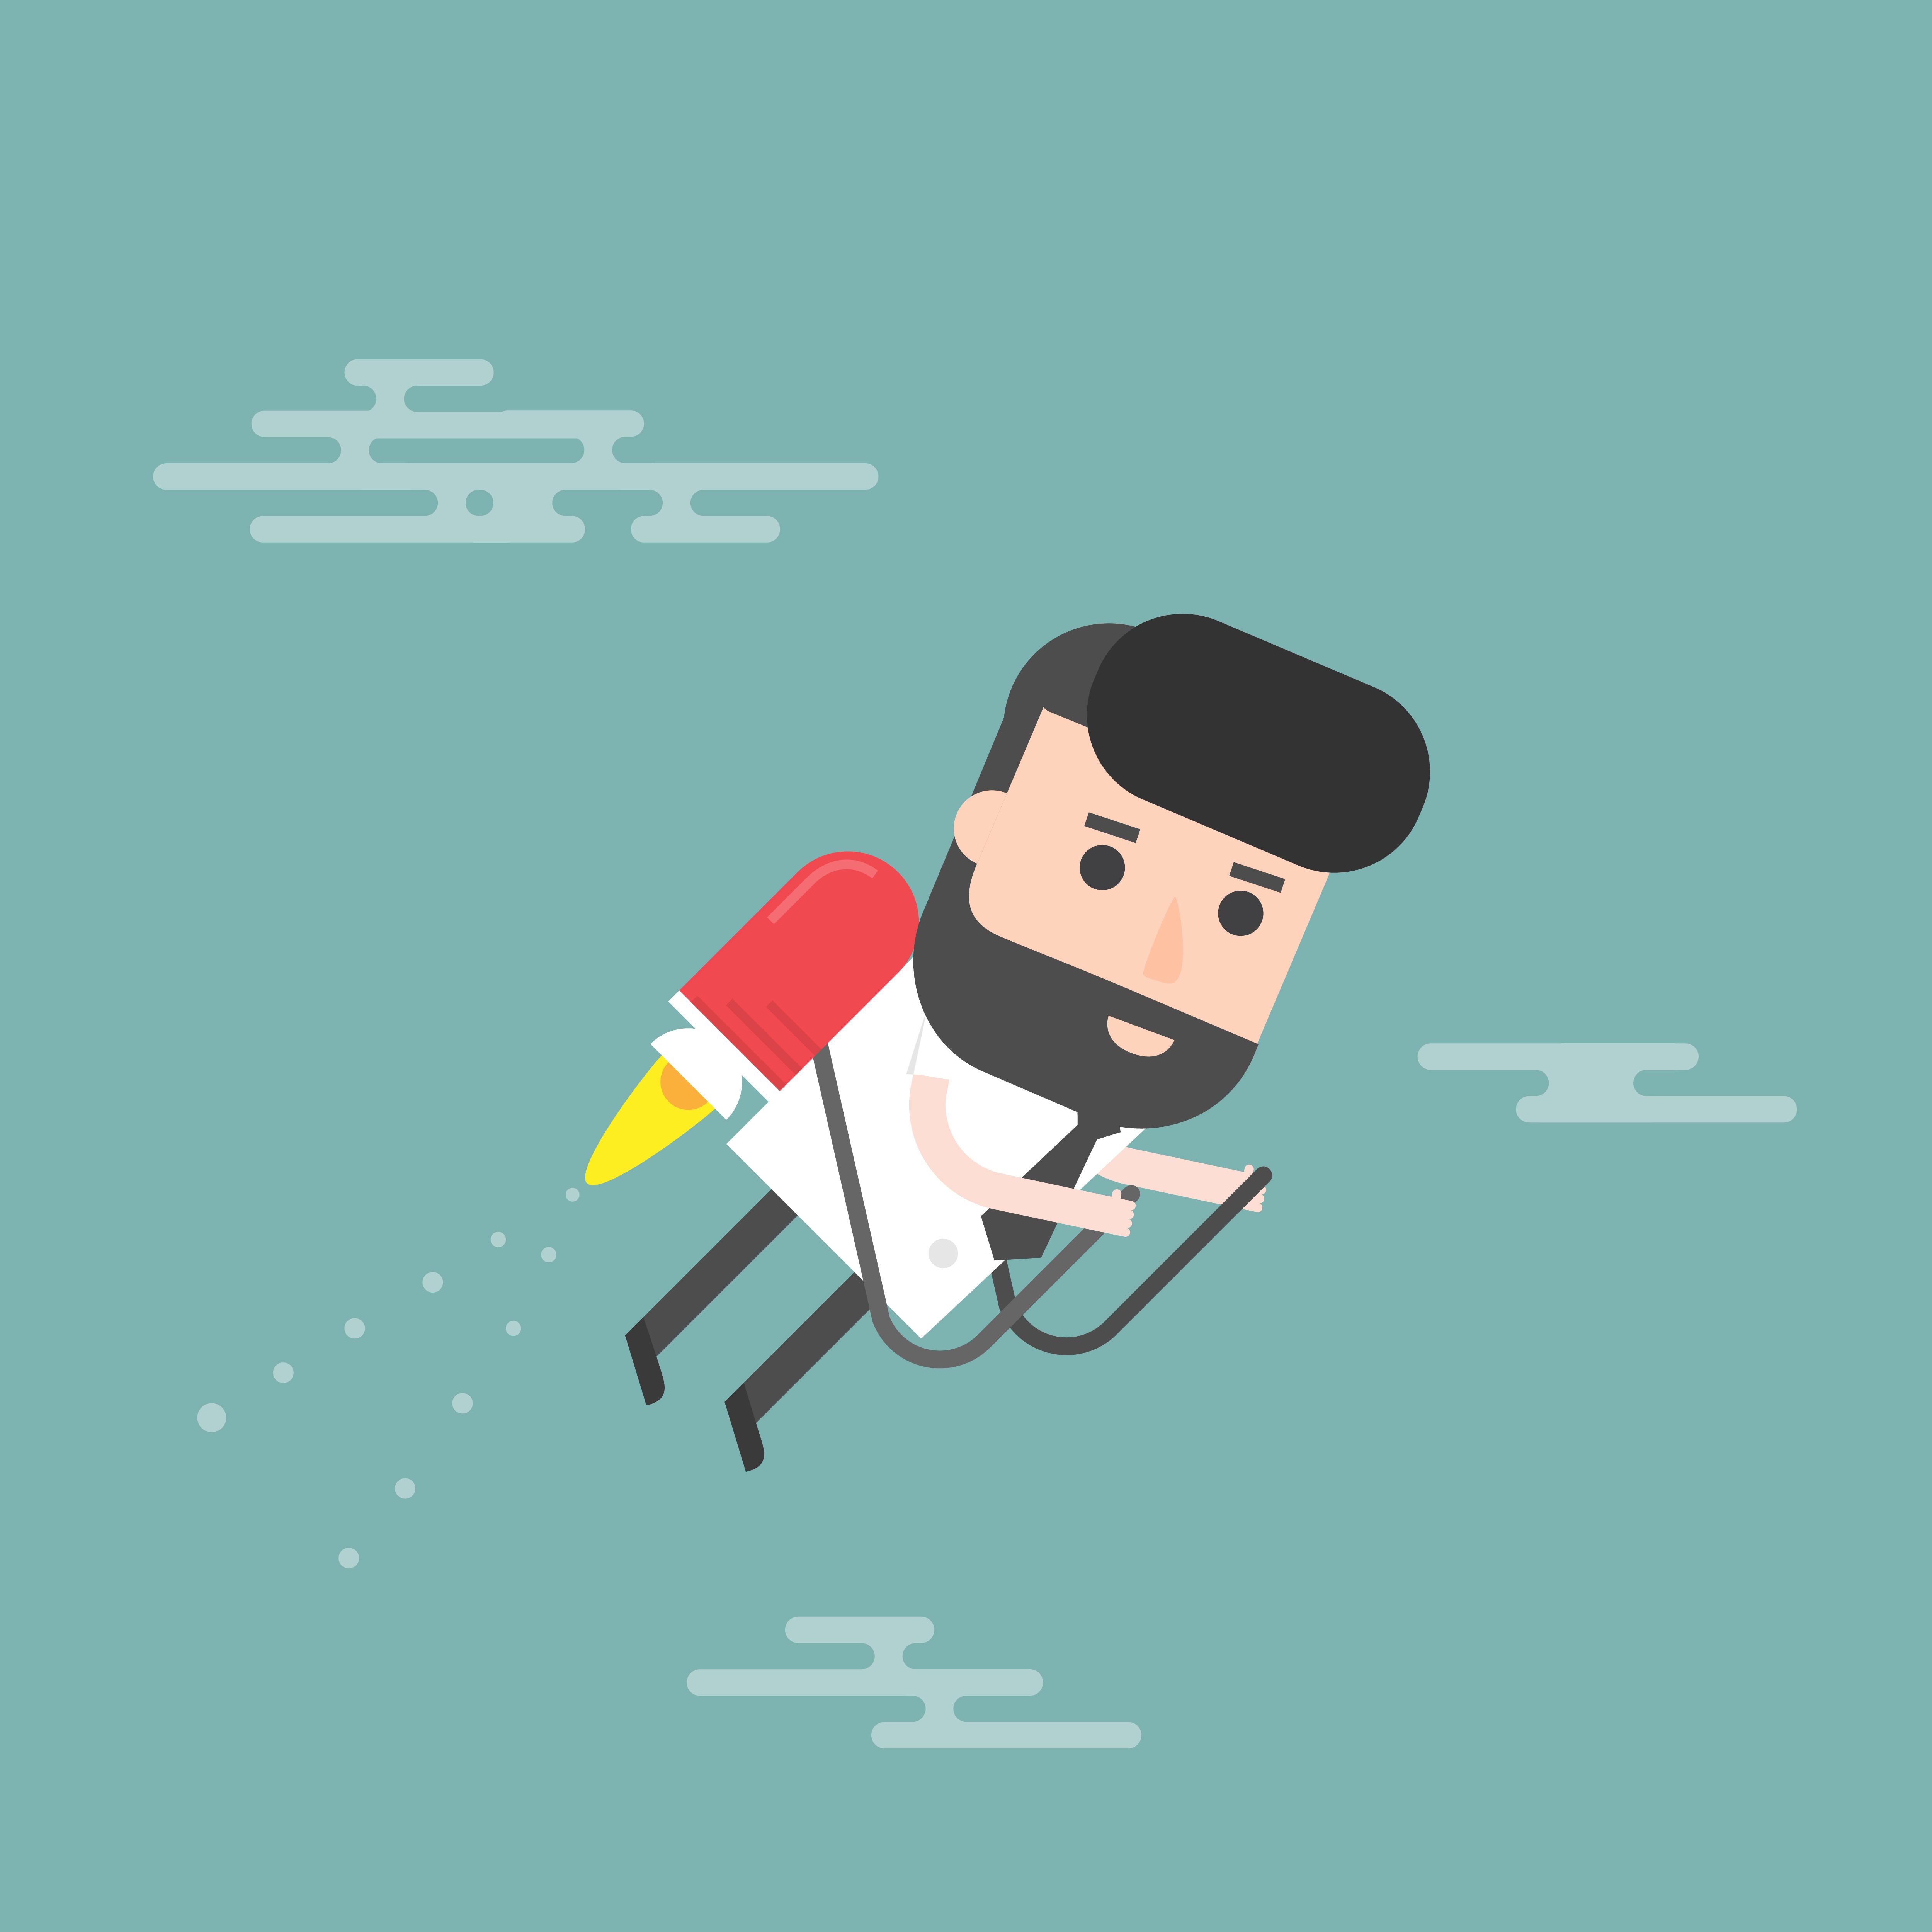 cartoon man on a jetpack